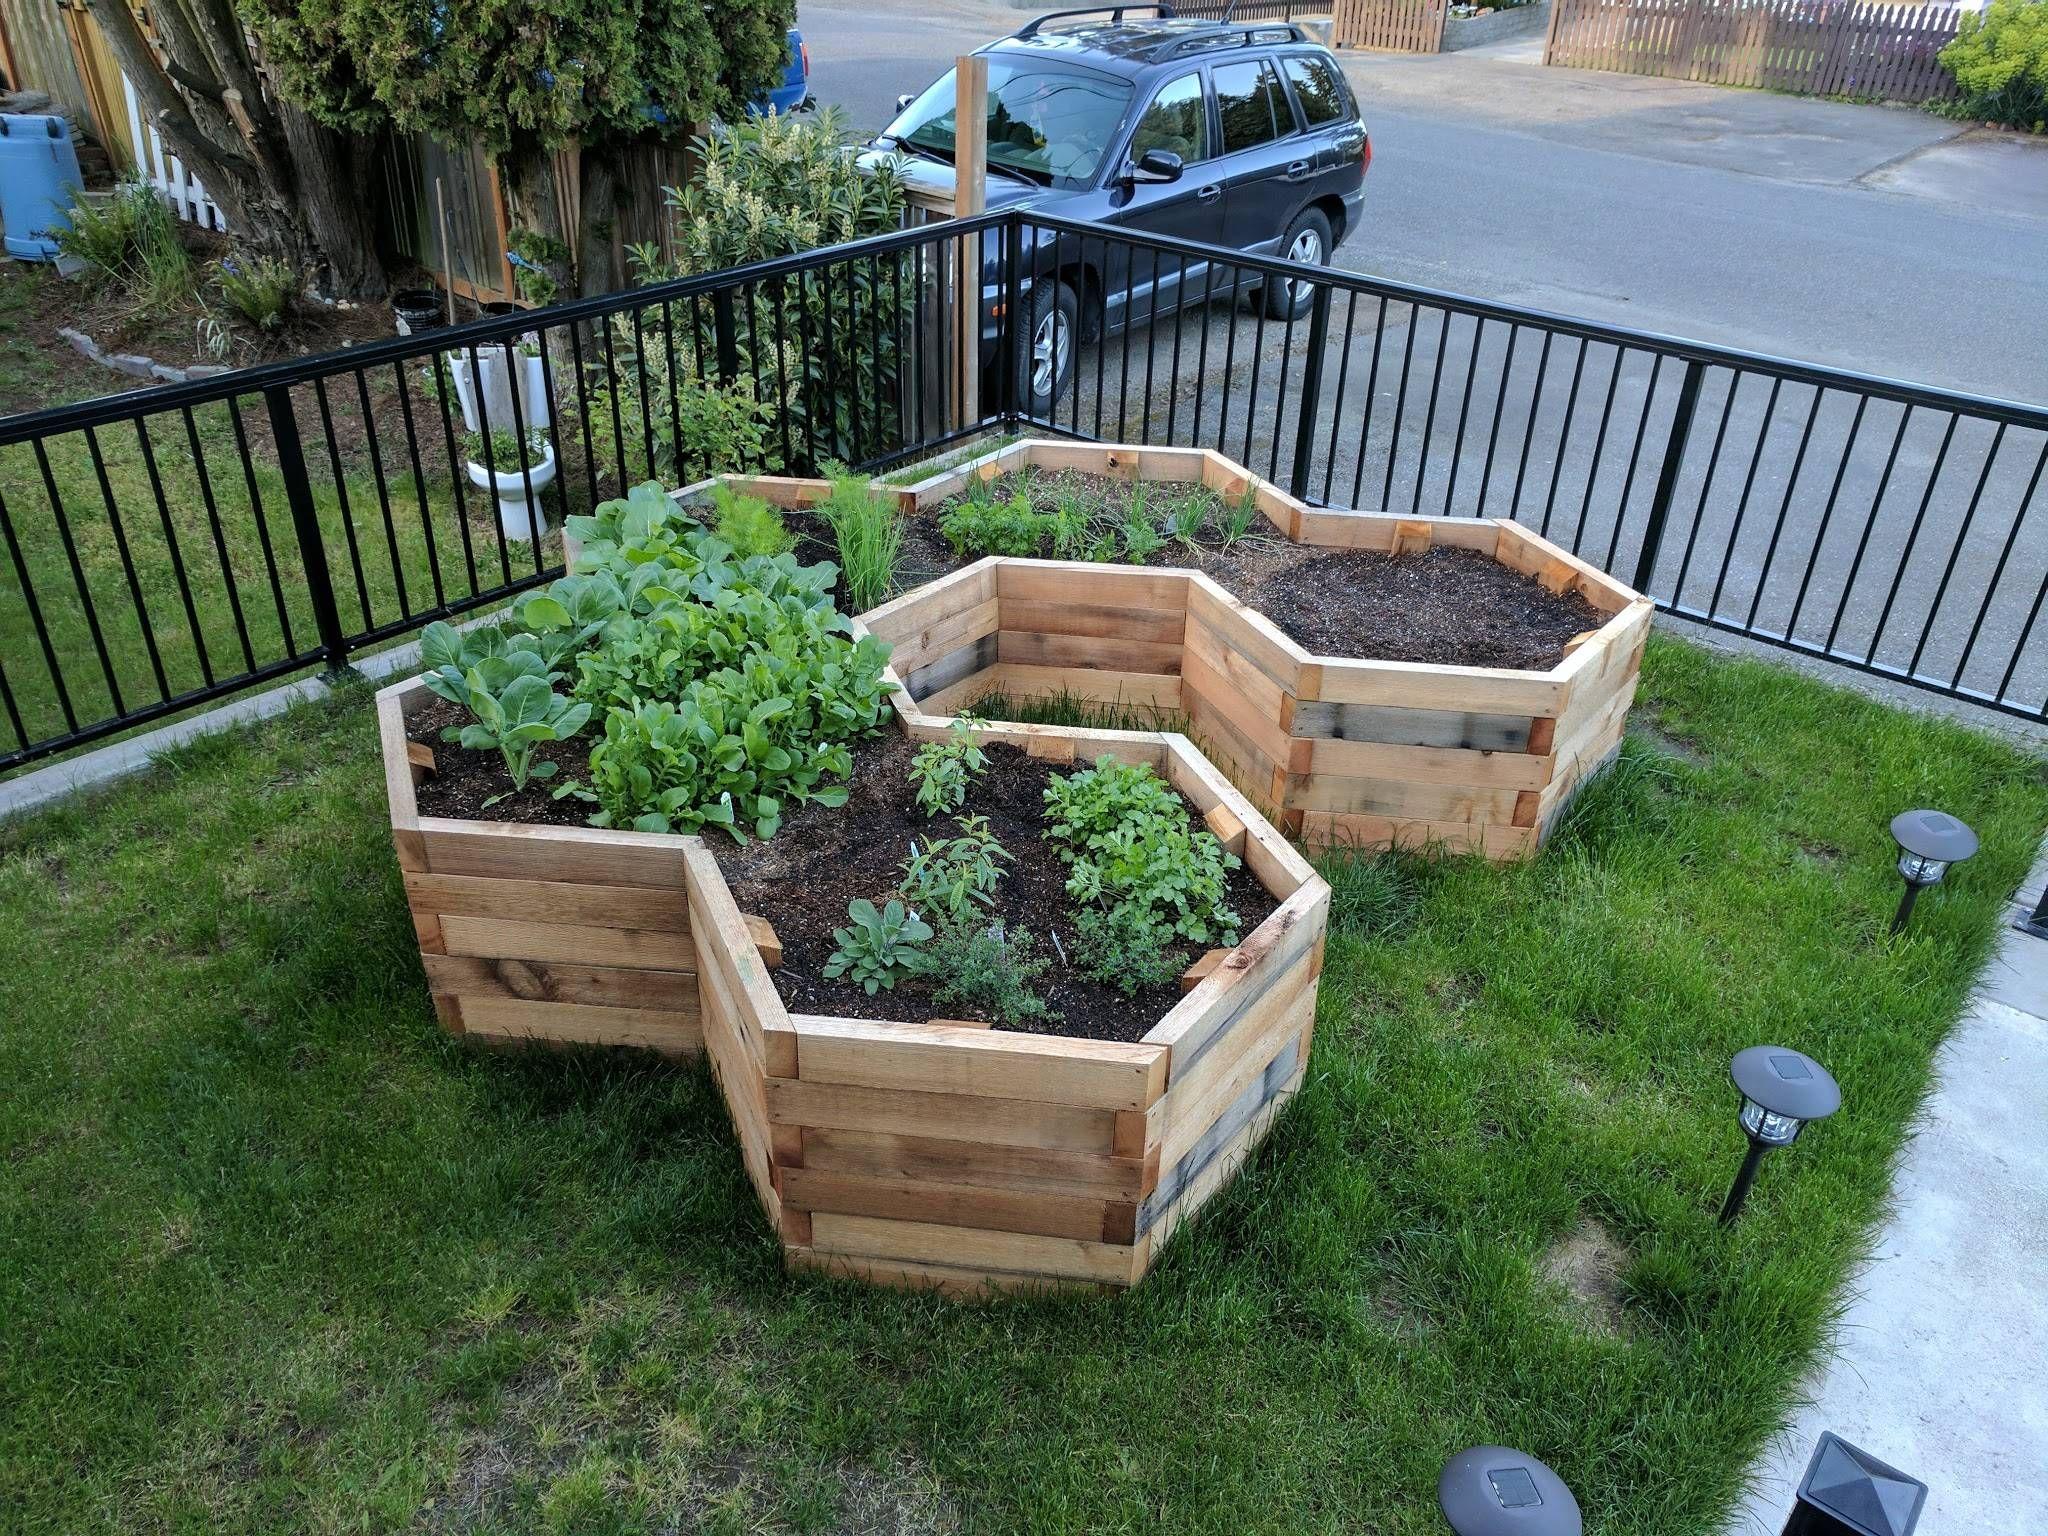 First Major Gardening Project Hexagonal Garden Beds Album On Imgur Garden Beds Vegetable Garden Raised Beds Garden Projects